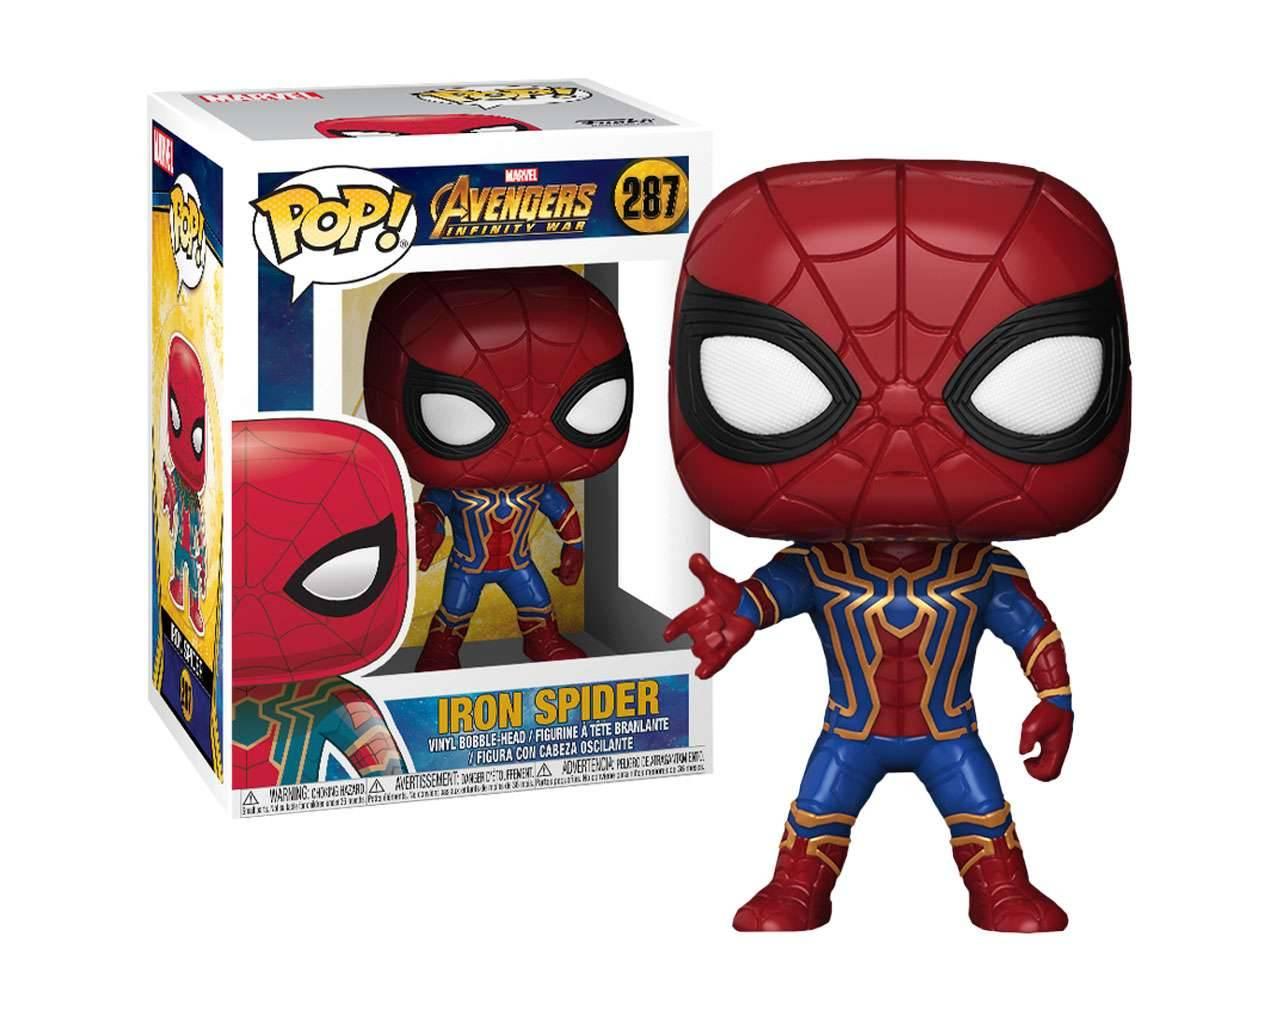 Iron Spider (Infinity War) Pop! Vinyl